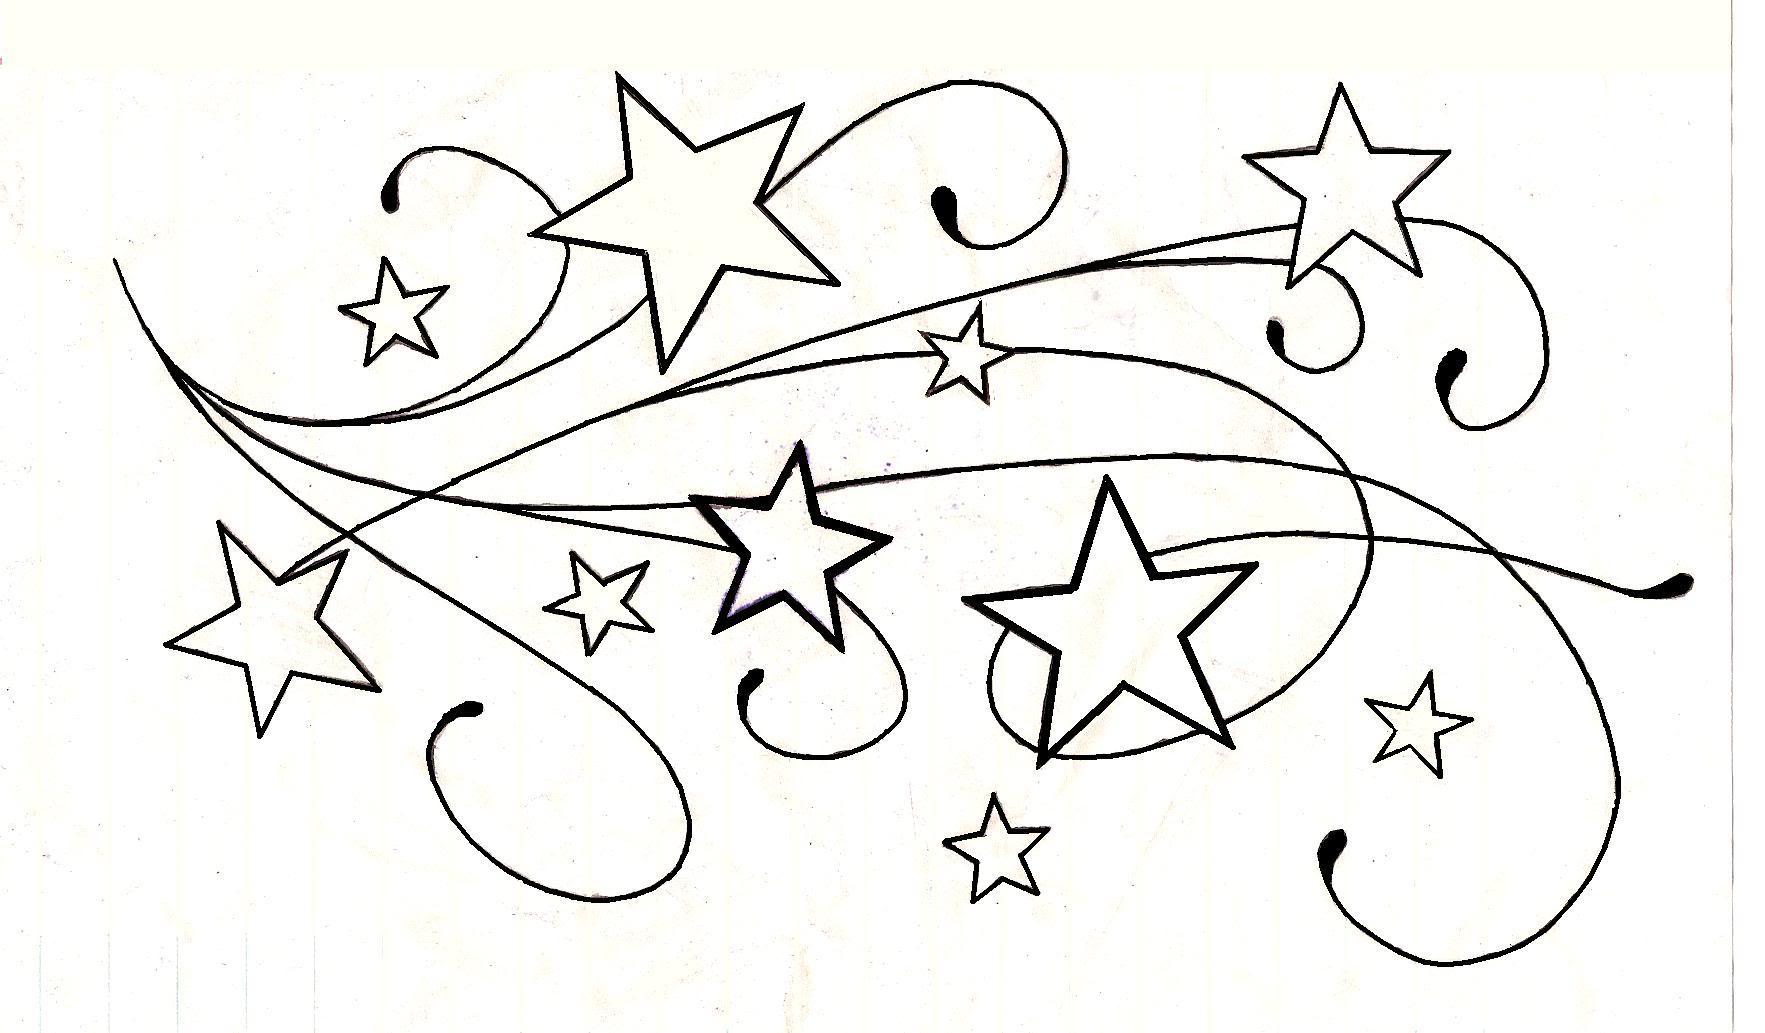 Outline Star Tattoos Designs